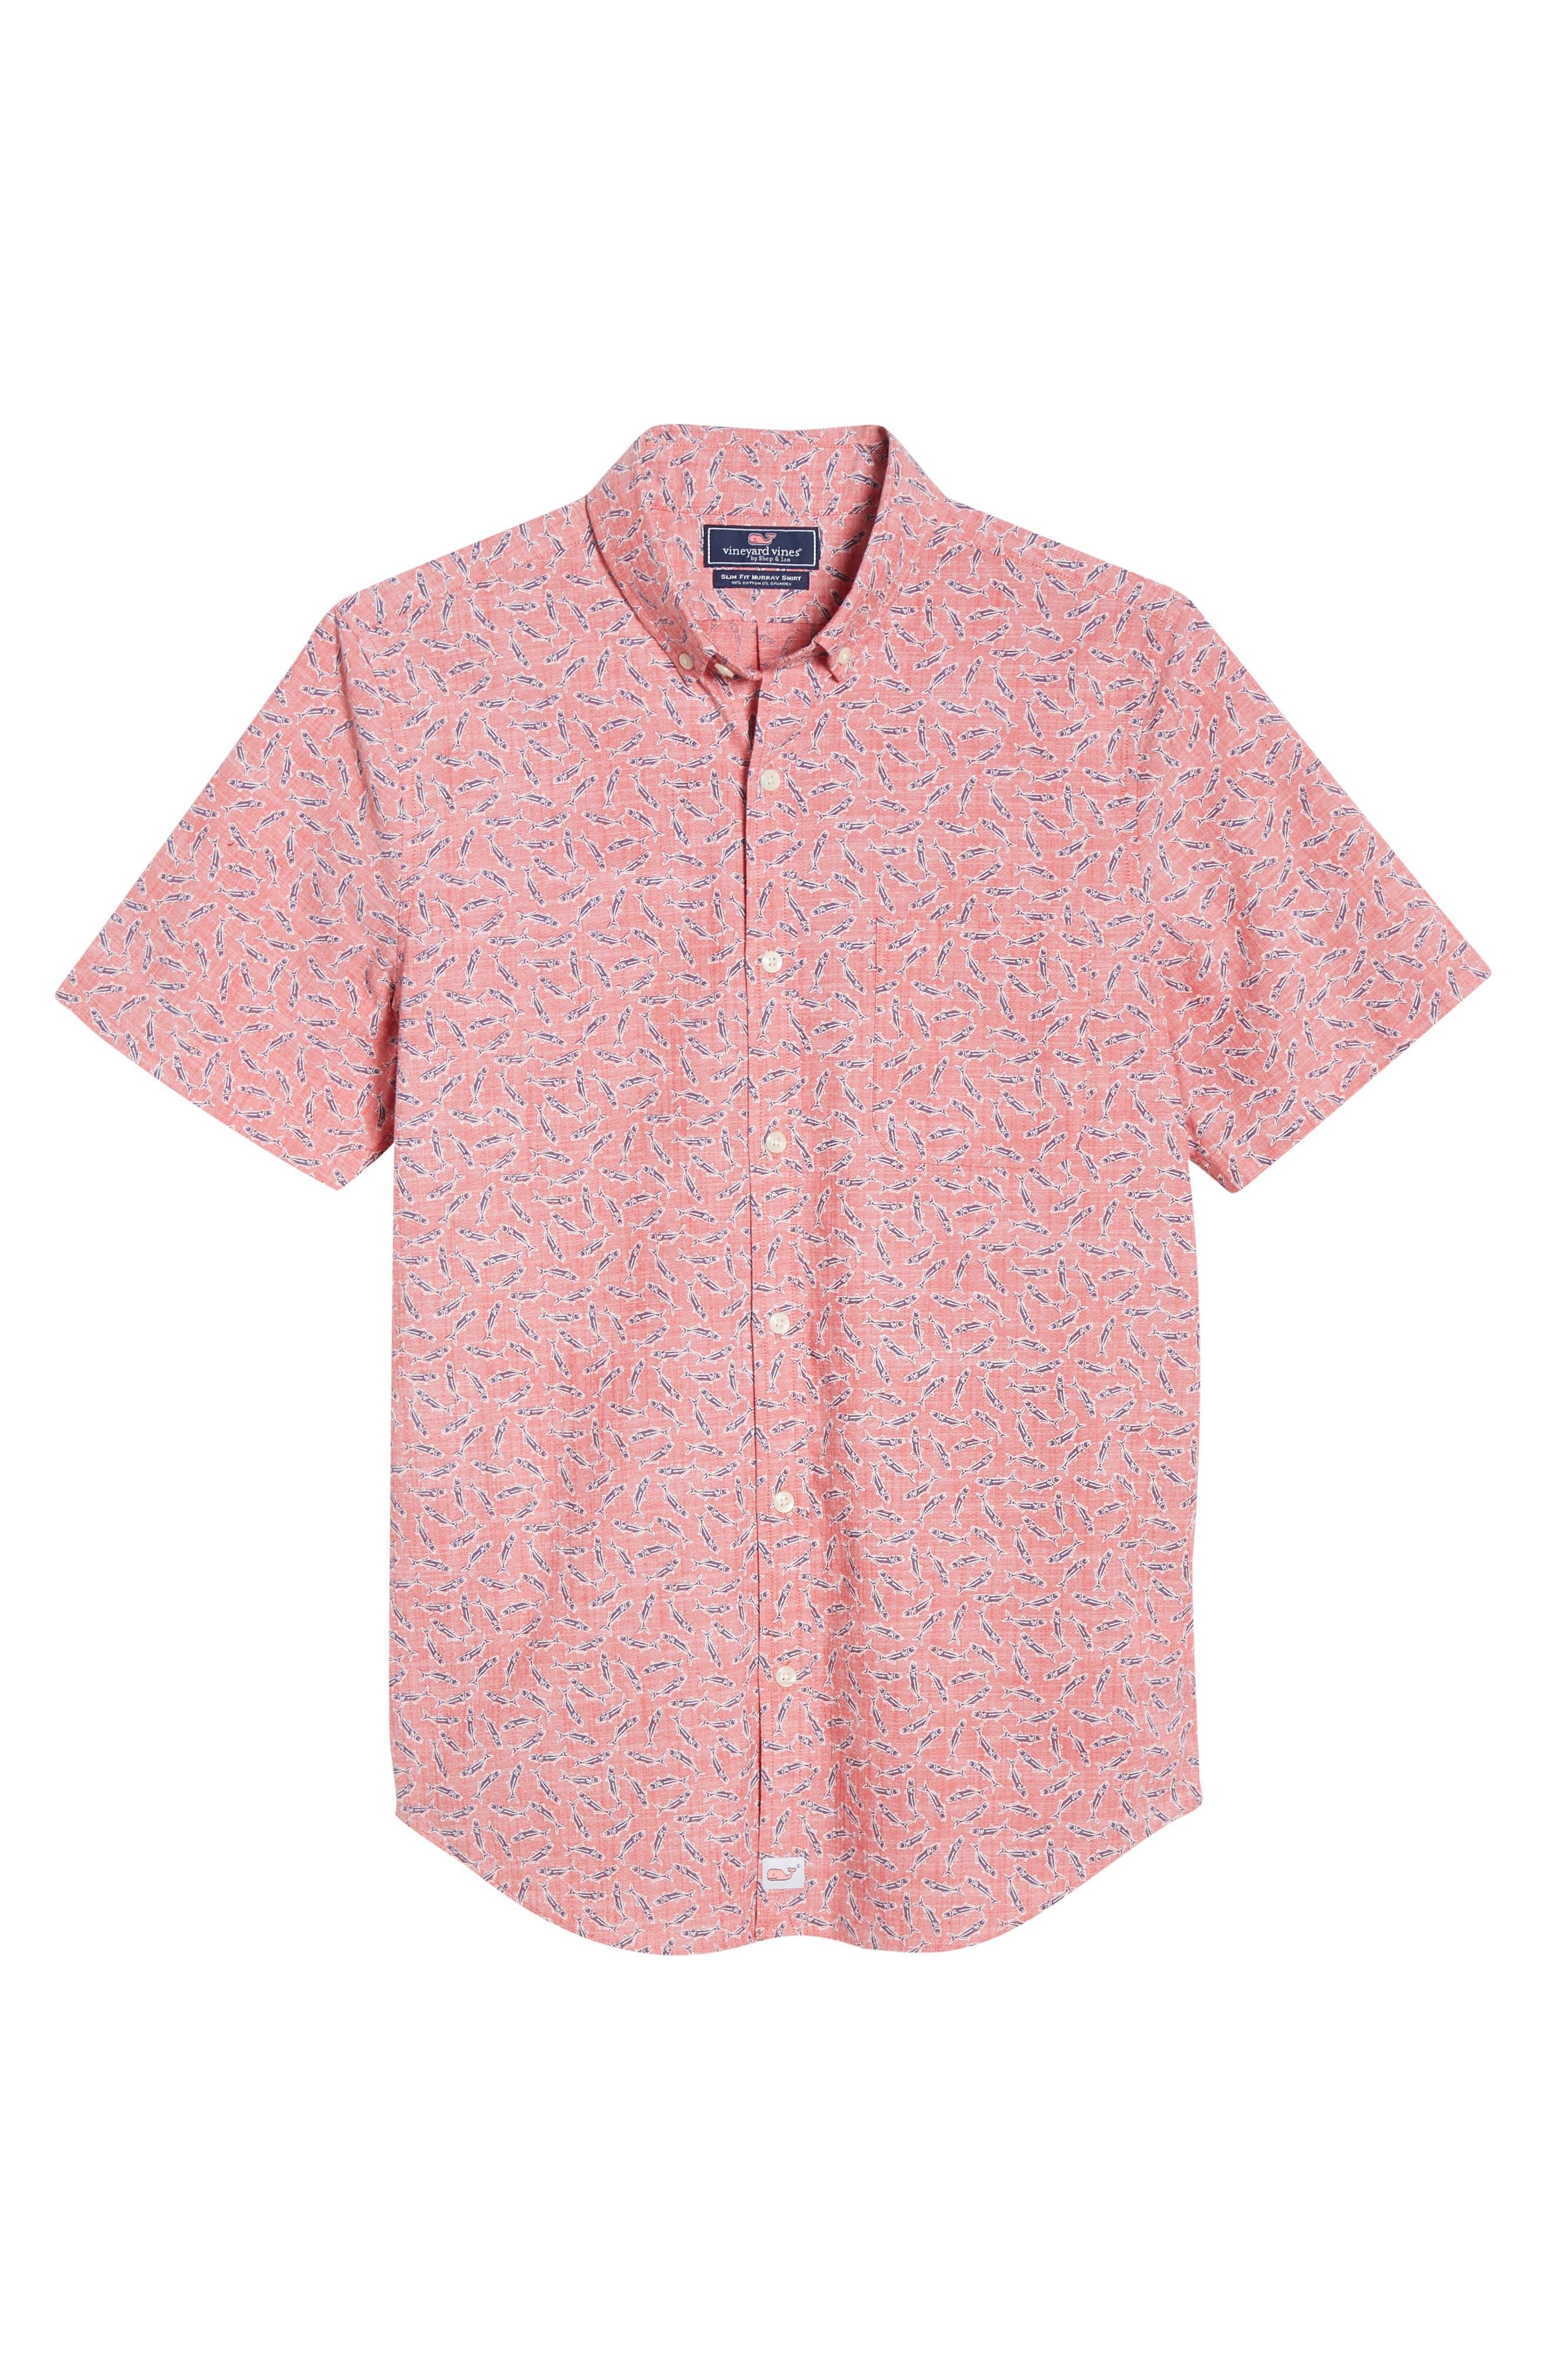 VINEYARD VINES, Murray Slim Fit Sport Shirt, Alternate thumbnail 5, color, 652